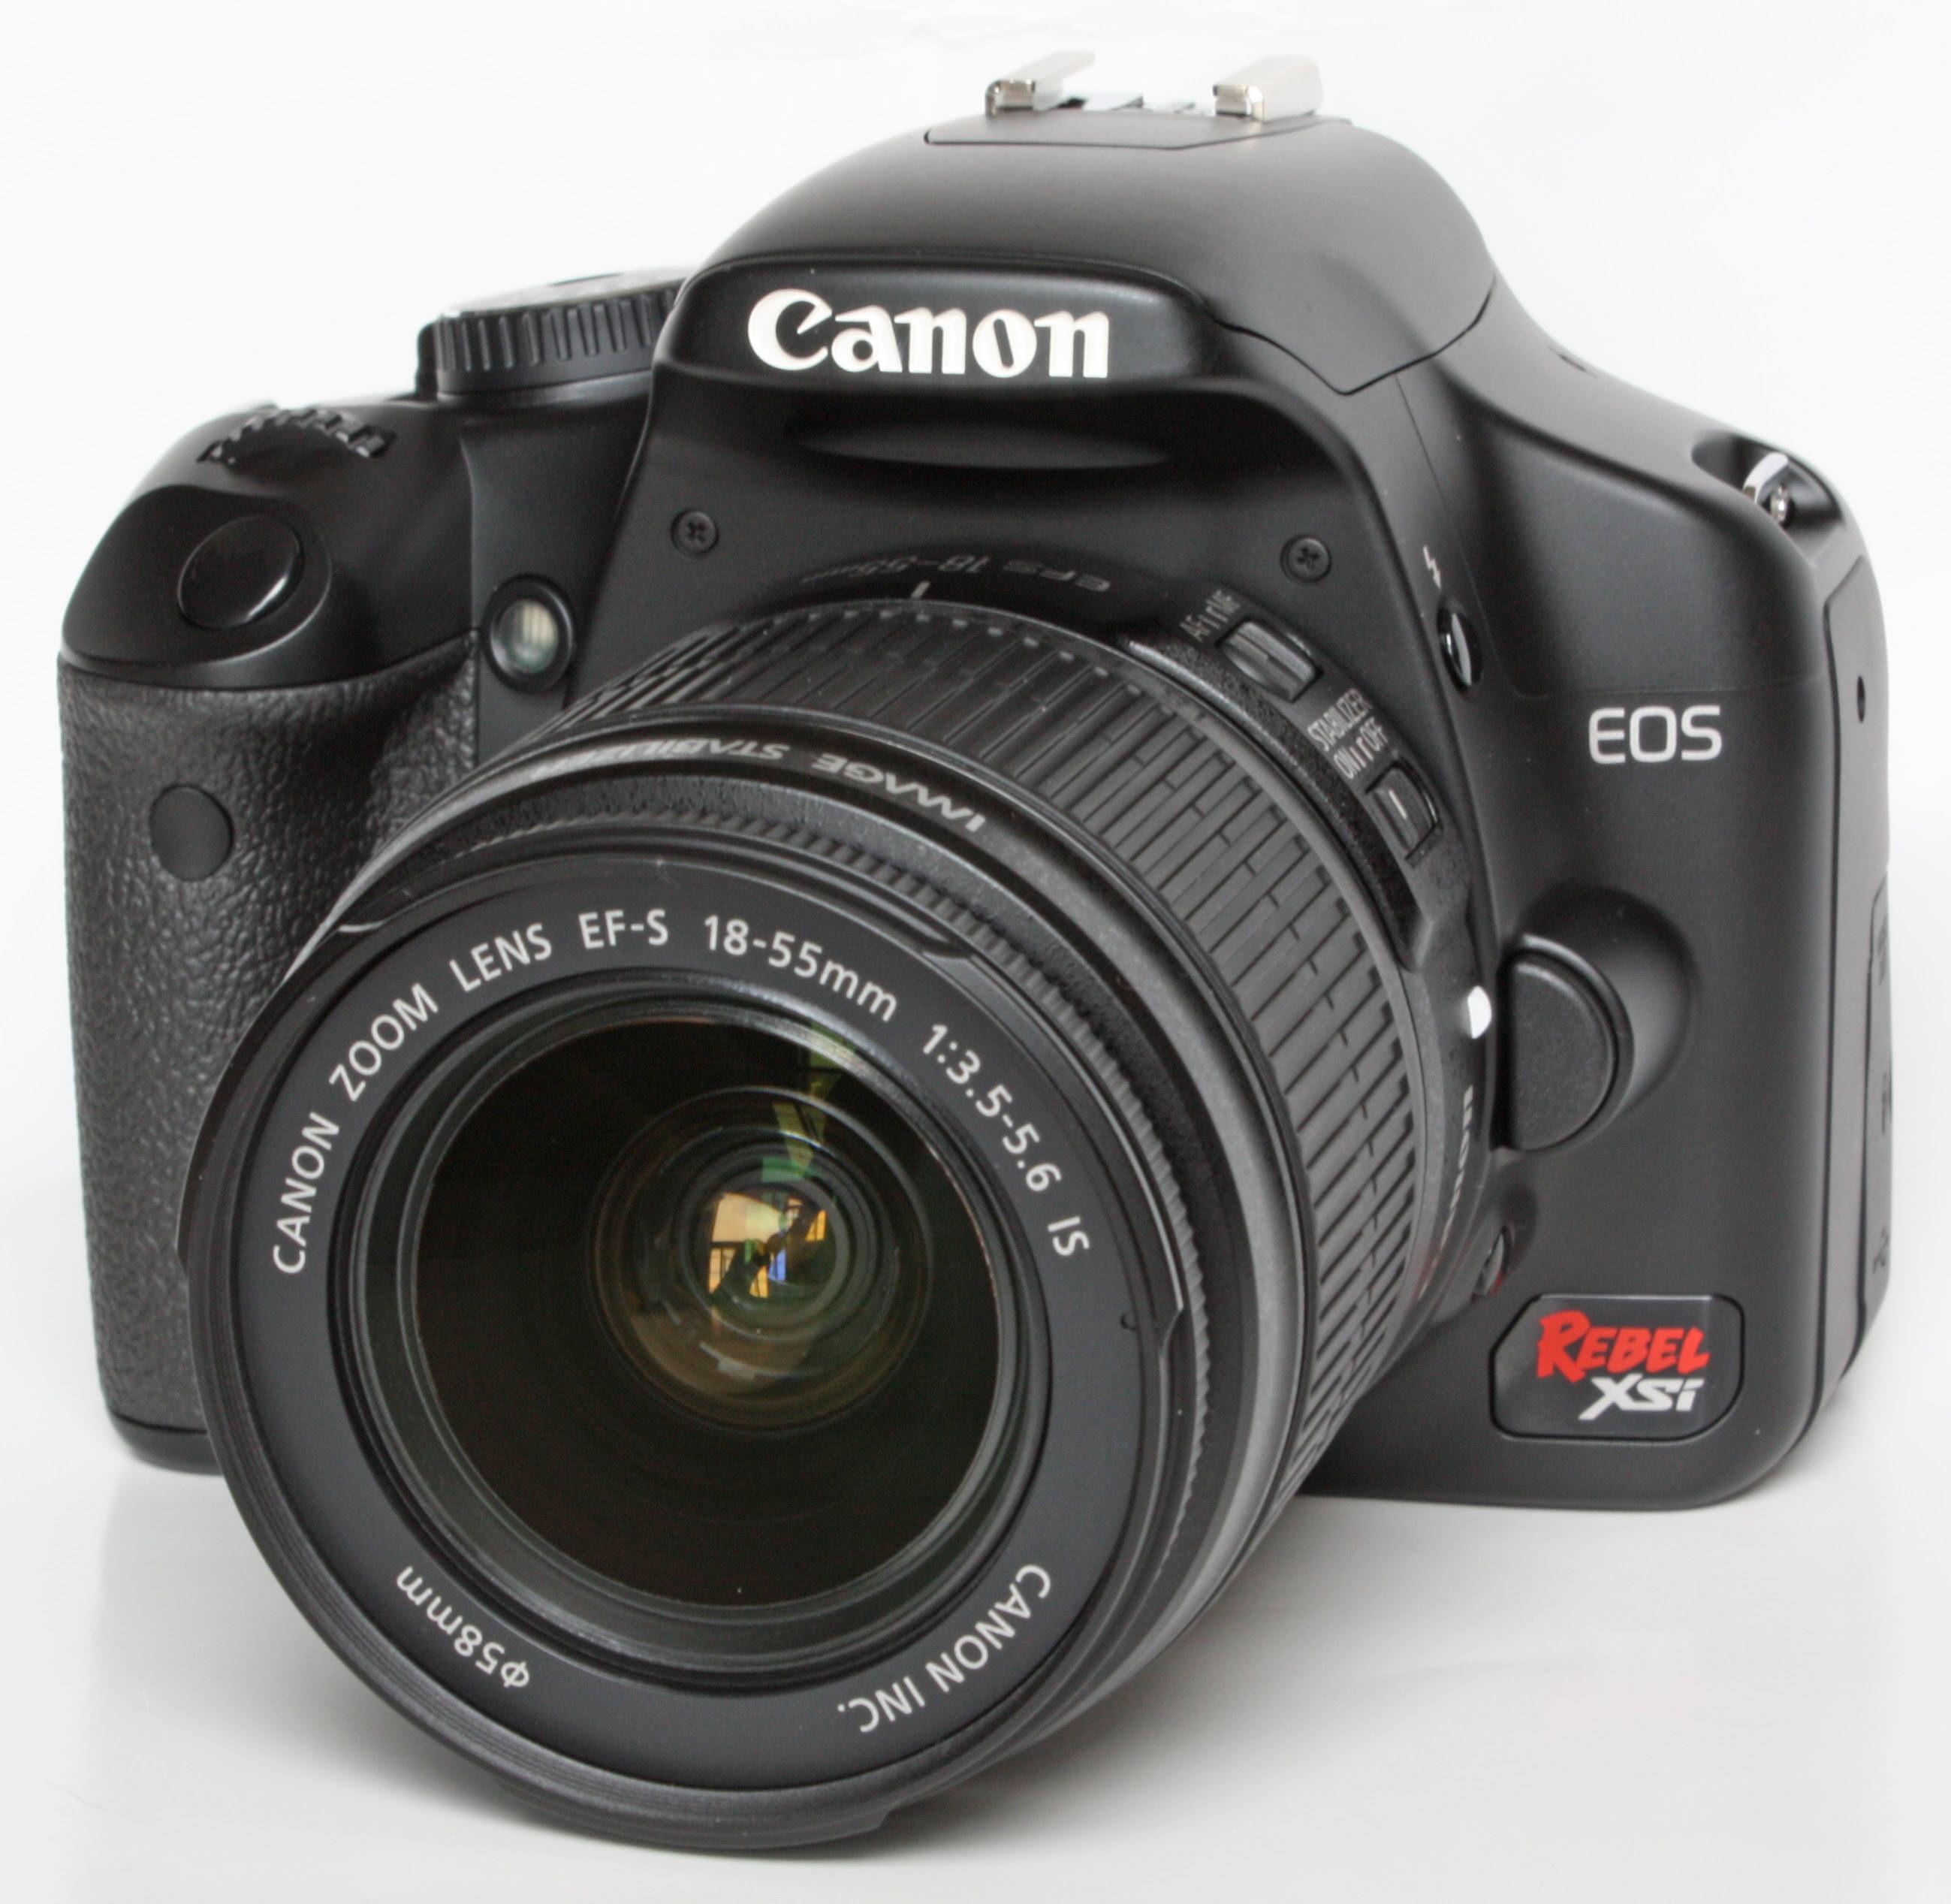 Canon Digital Rebel XSi с присоединённым объективом Canon EF-S 15-55 mm f/3.5-5.6 IS. Фото: Wikipedia